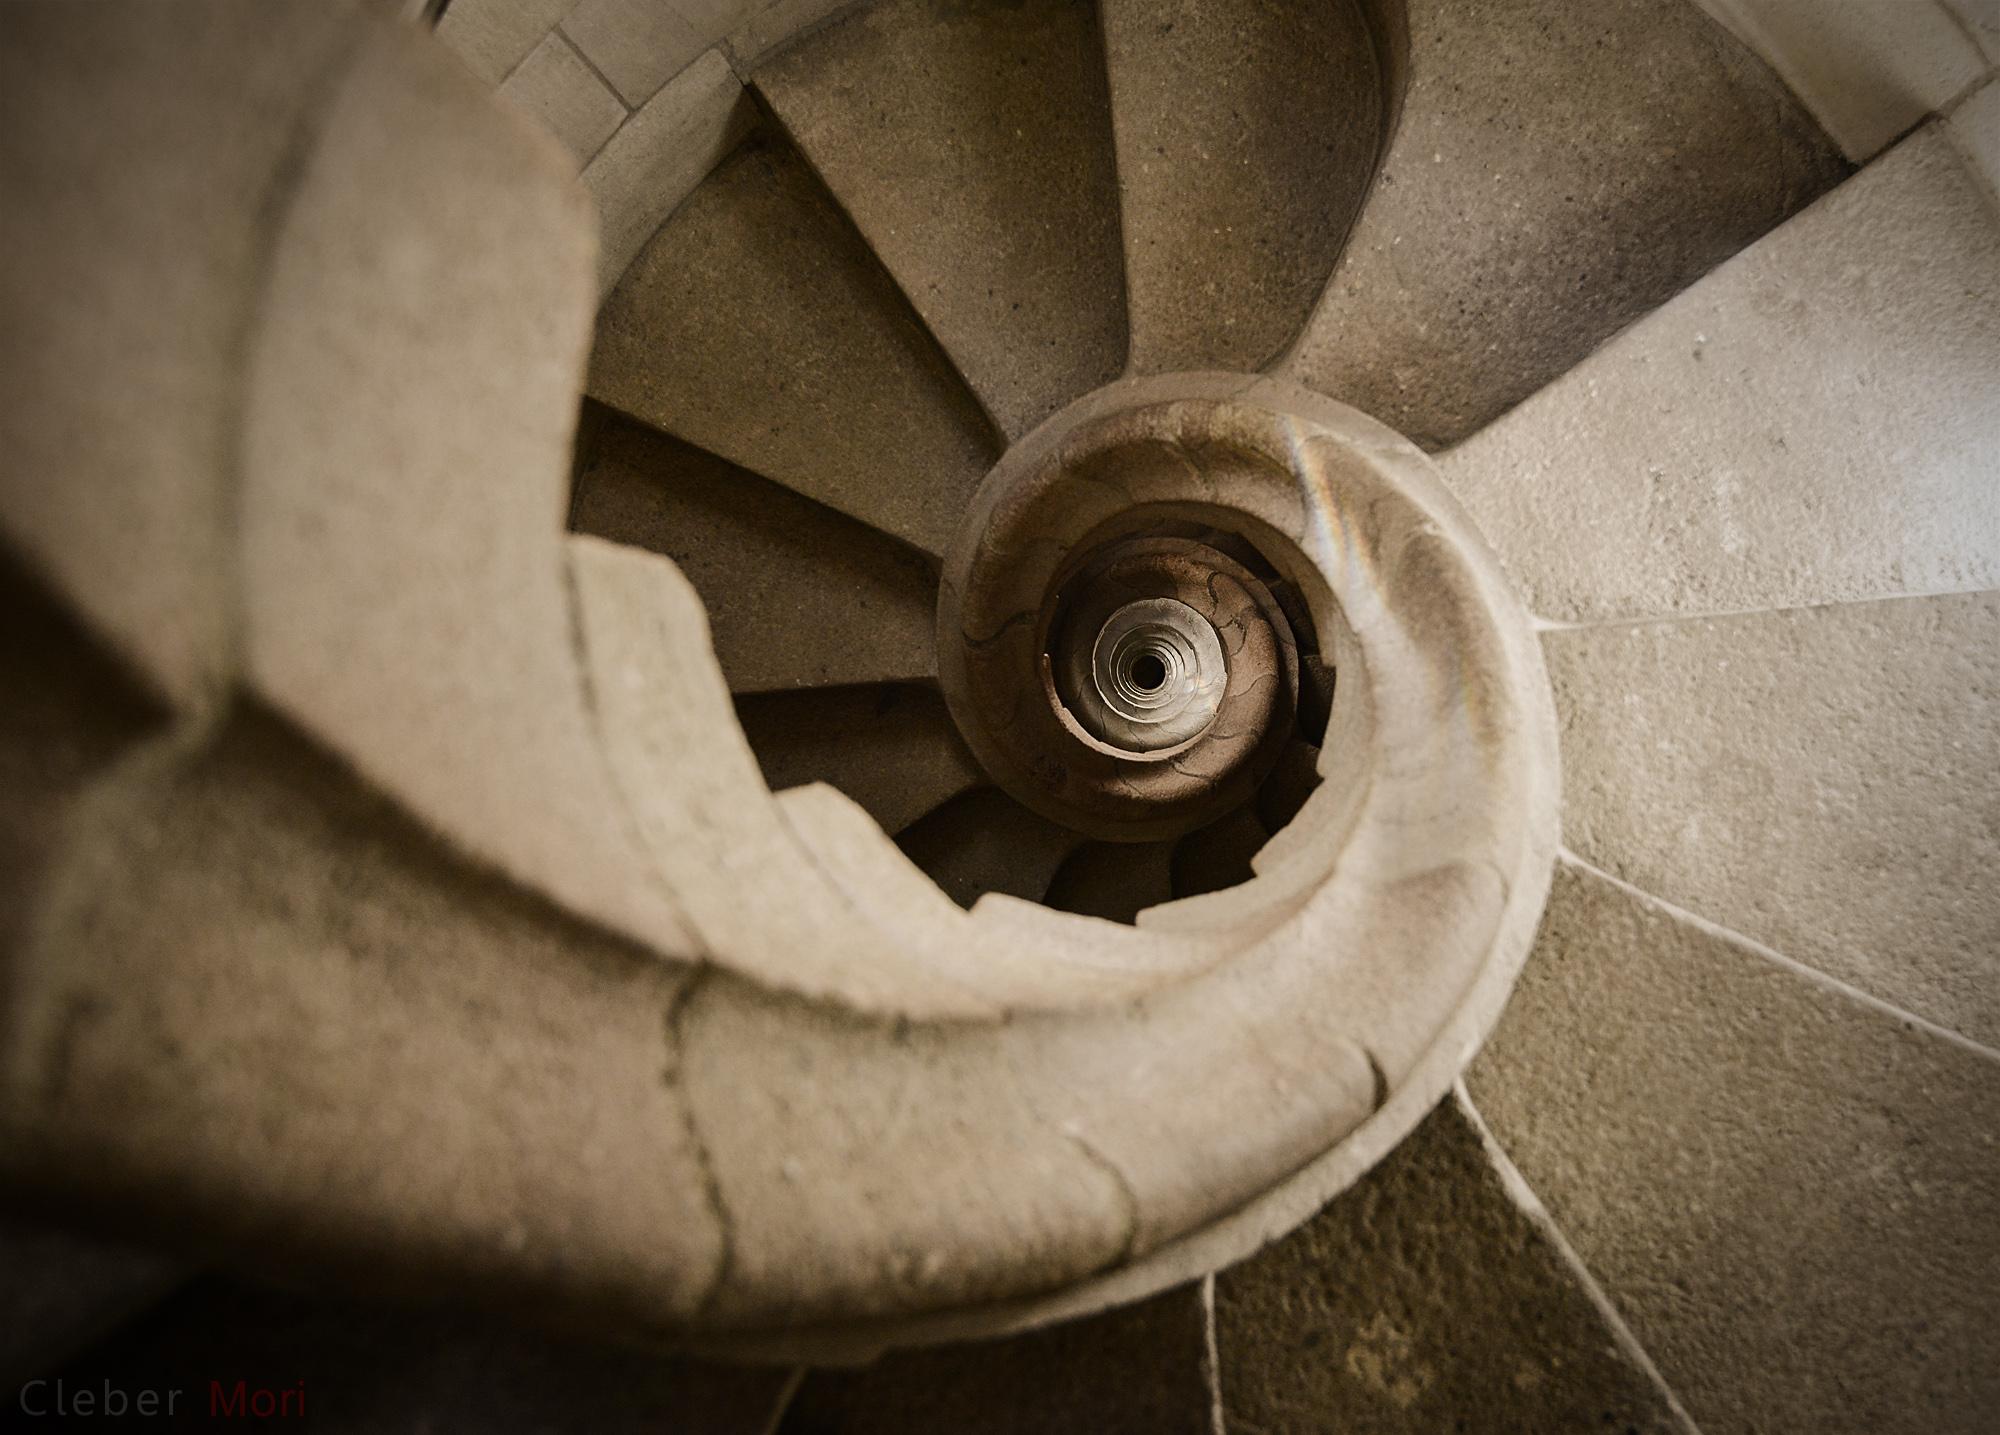 Stairs at the Sagrada Familia, Barcelona. Image credit Cleber Mori.